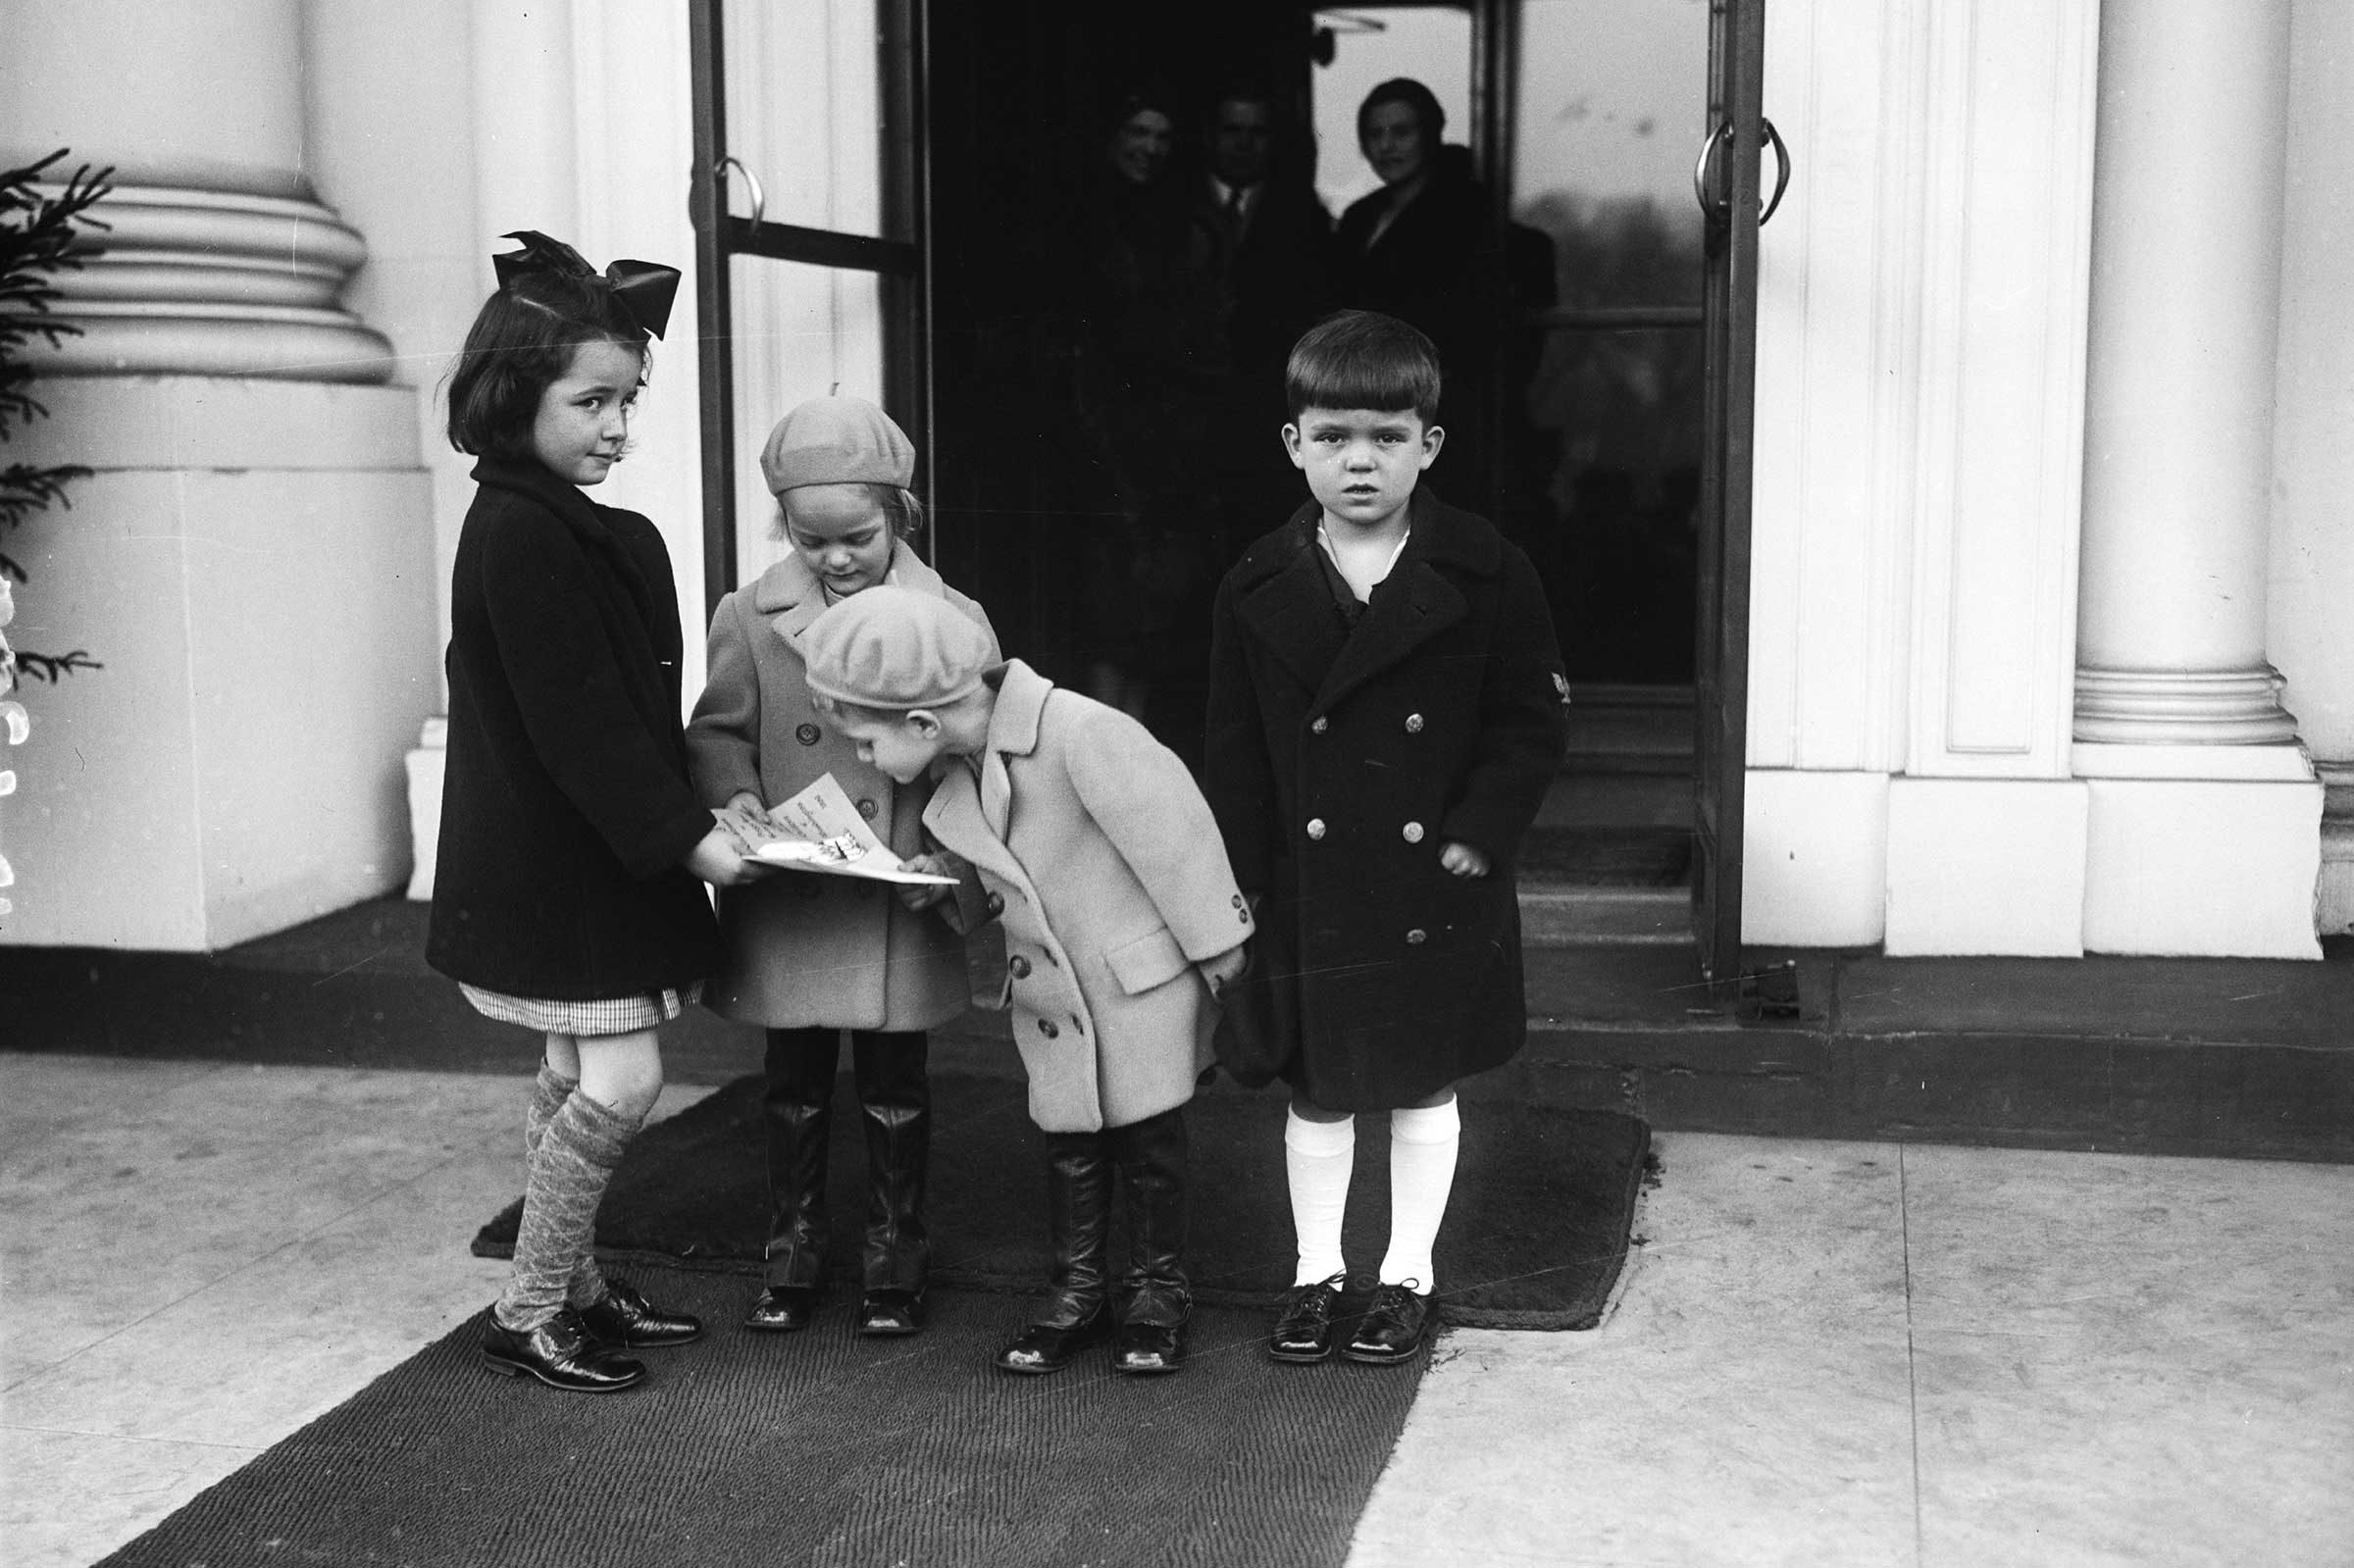 harris ewinglibrary of congress - Vintage Christmas Photos